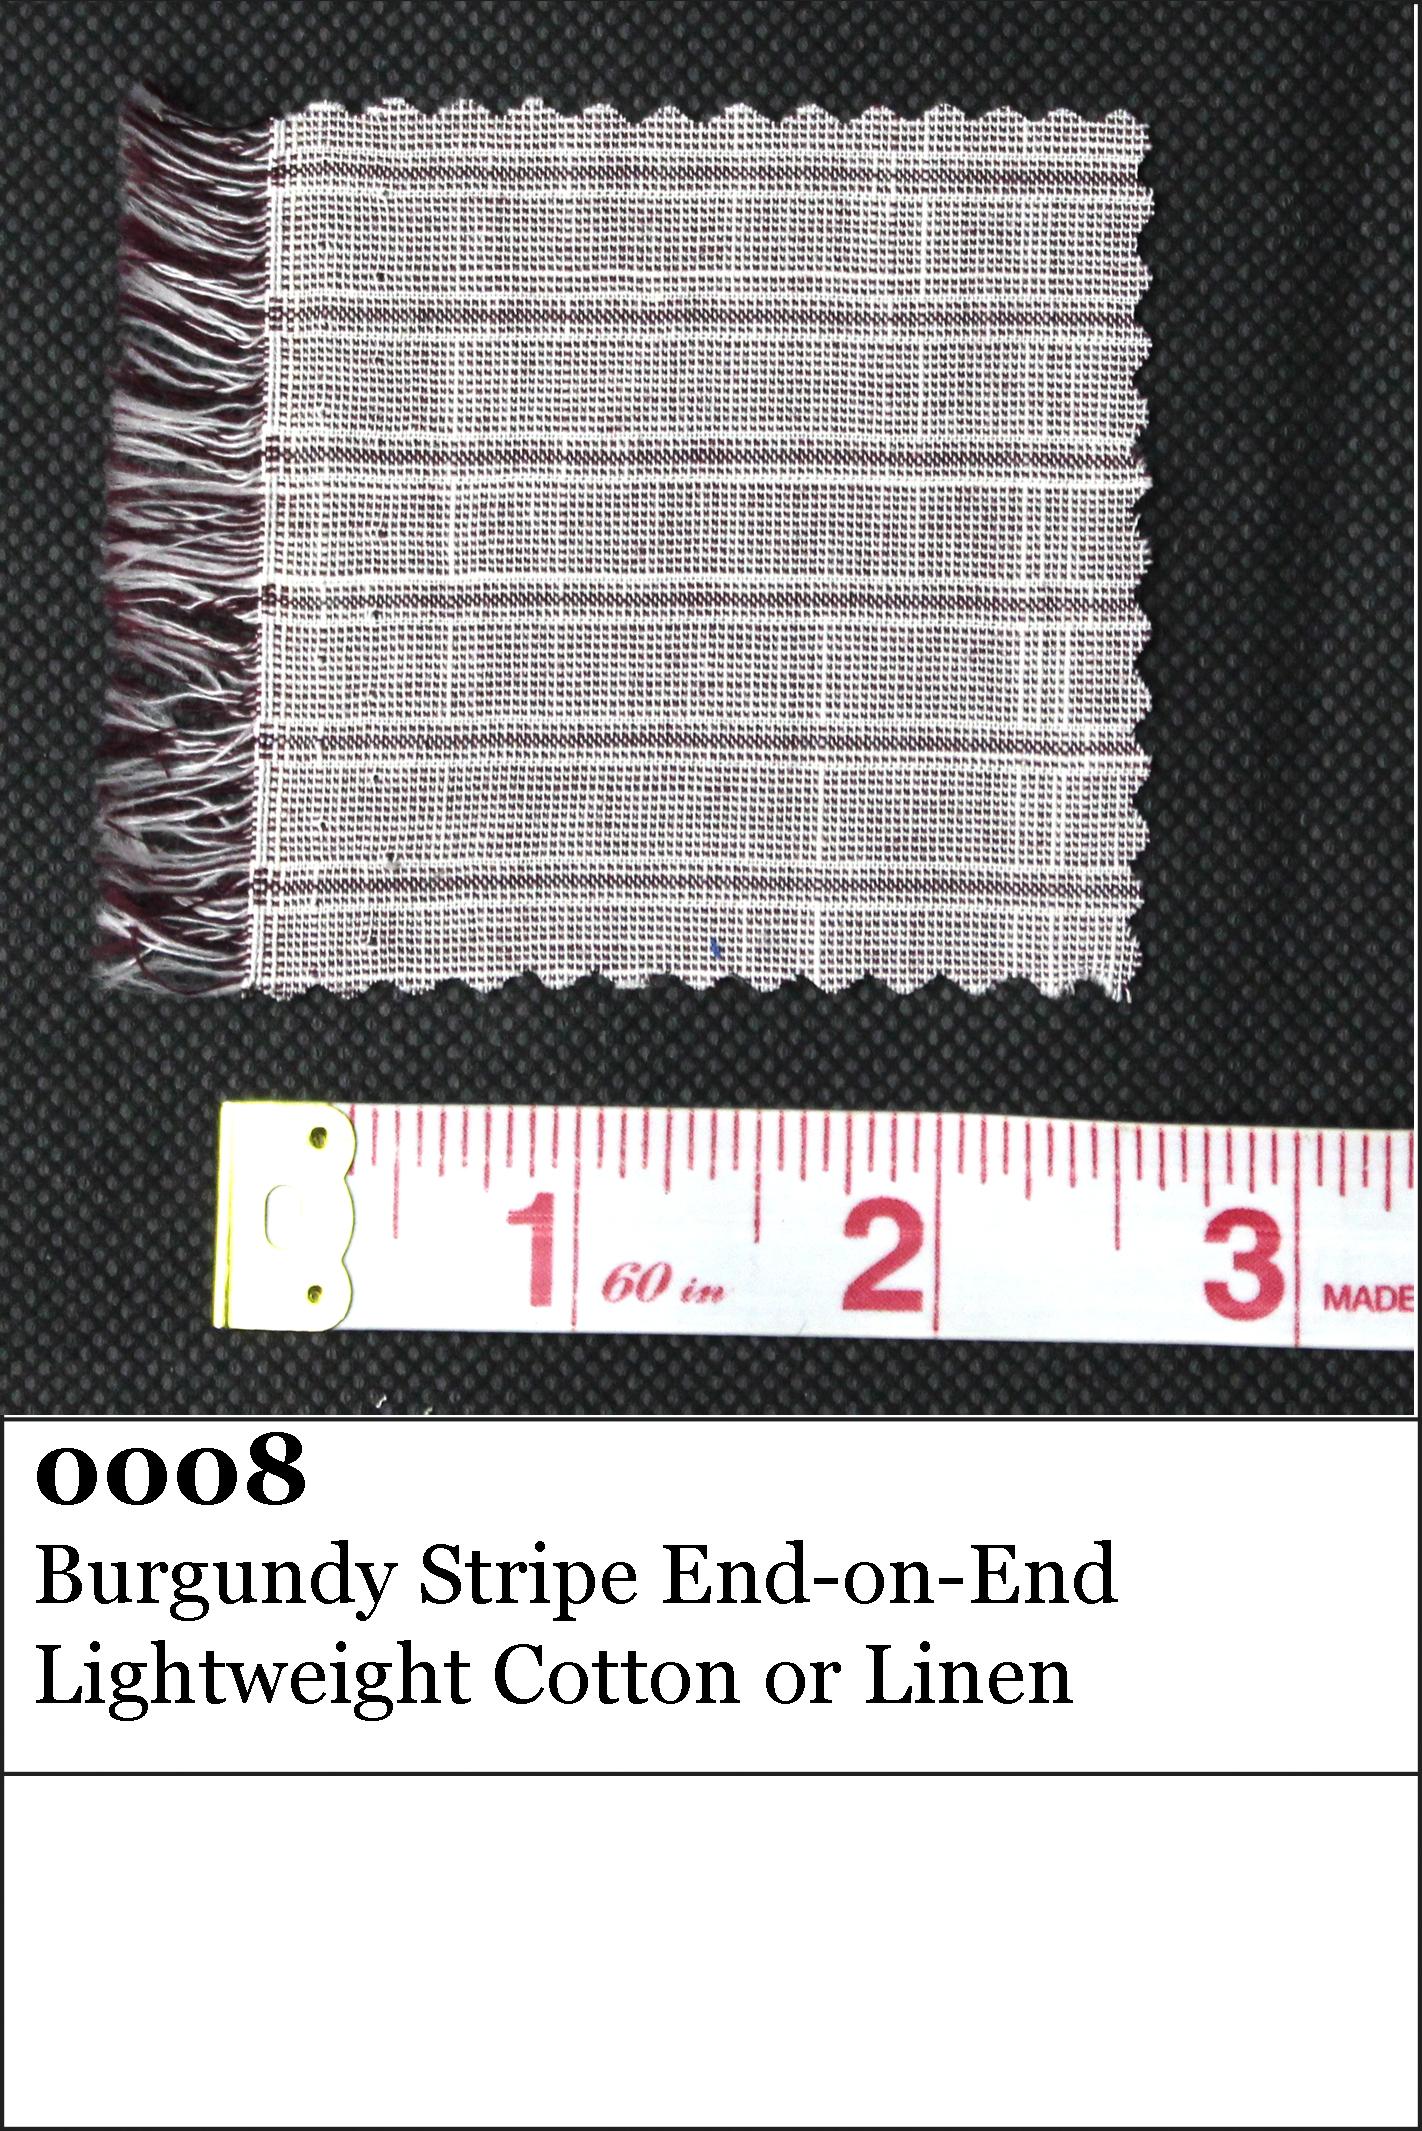 Fabric0008.jpg